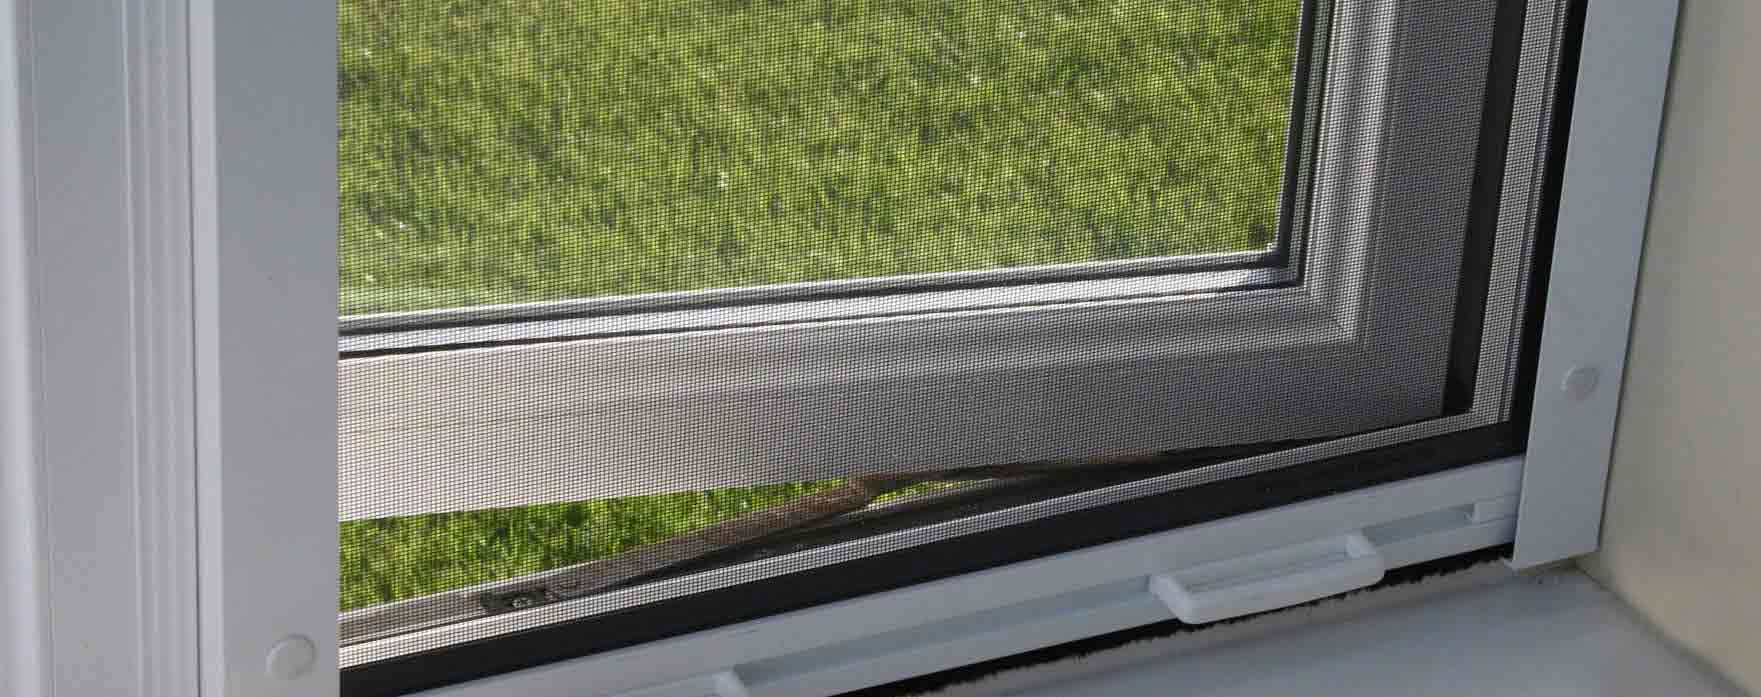 Flyscreen on window